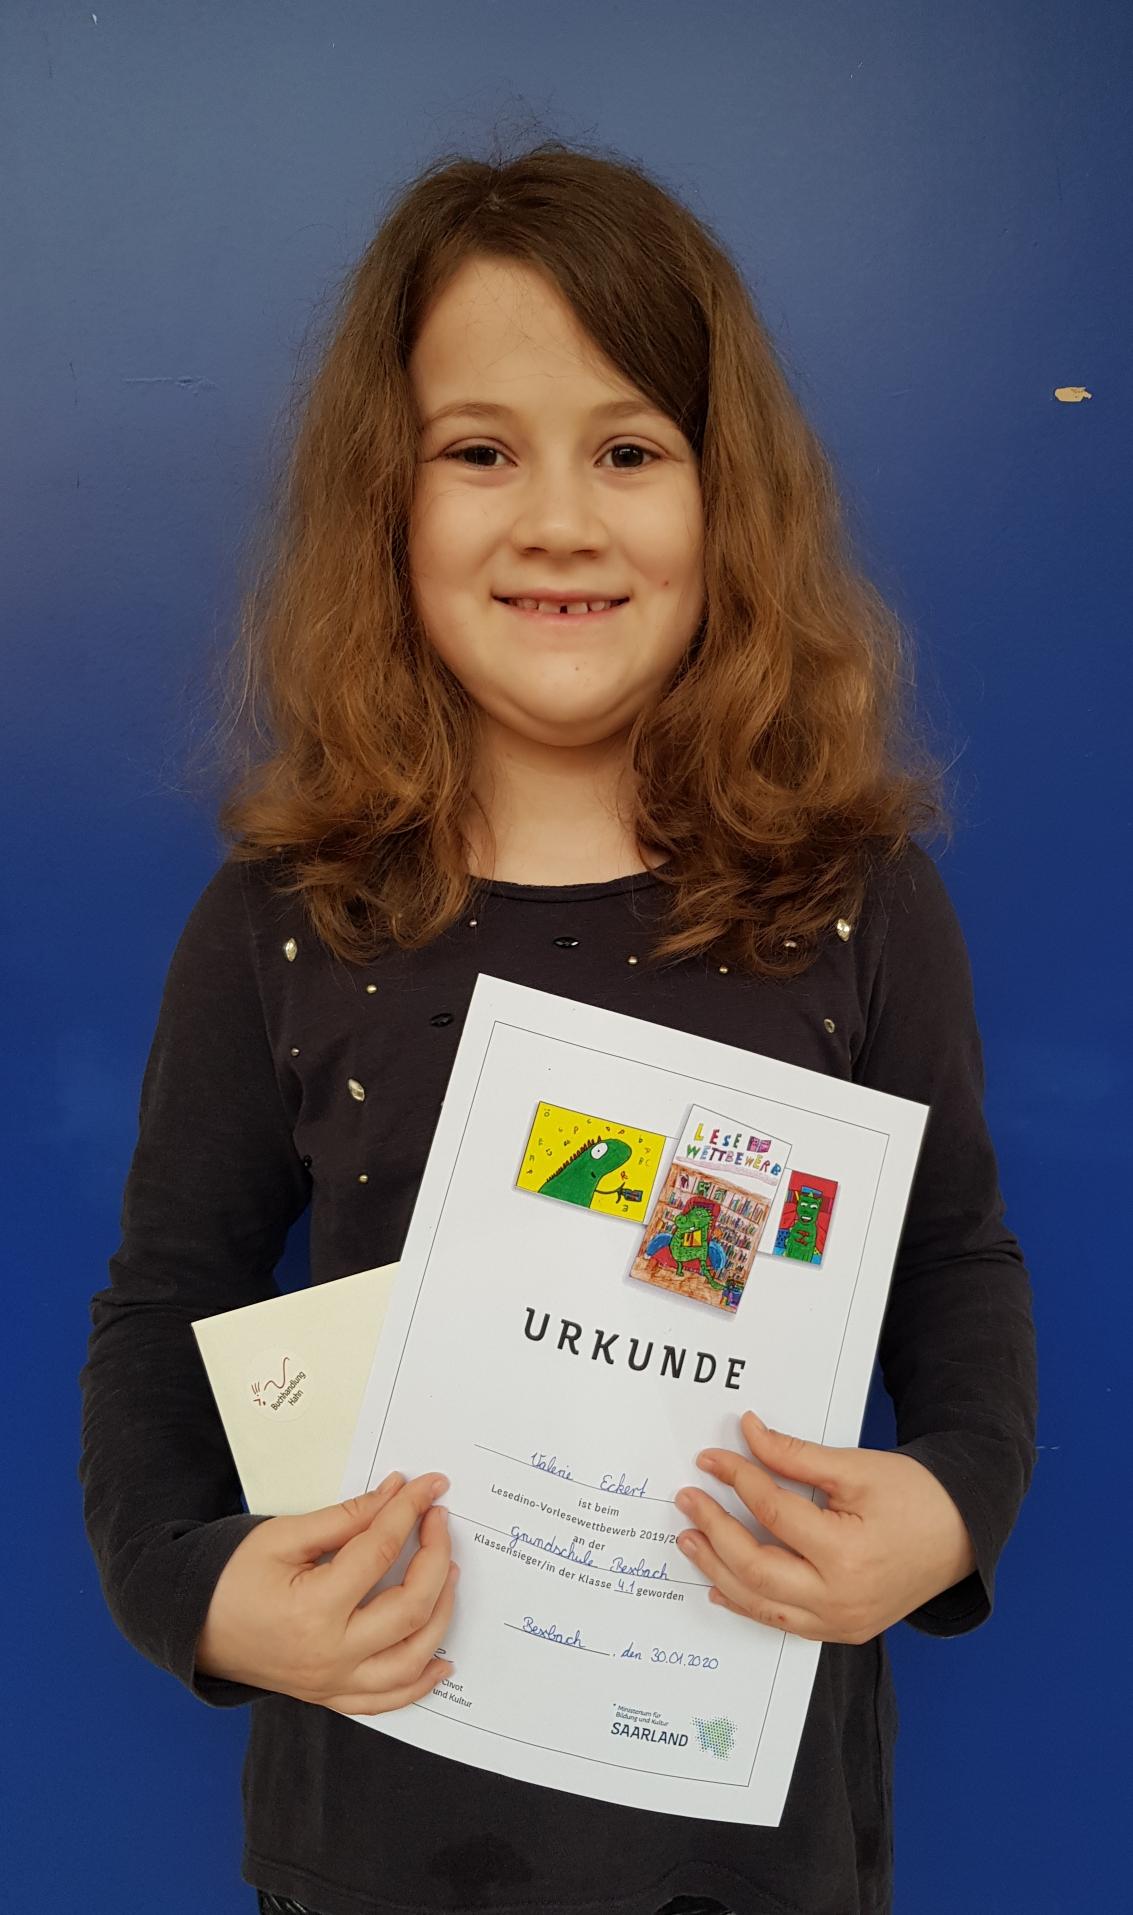 Valerie Eckert aus Klasse 4.1